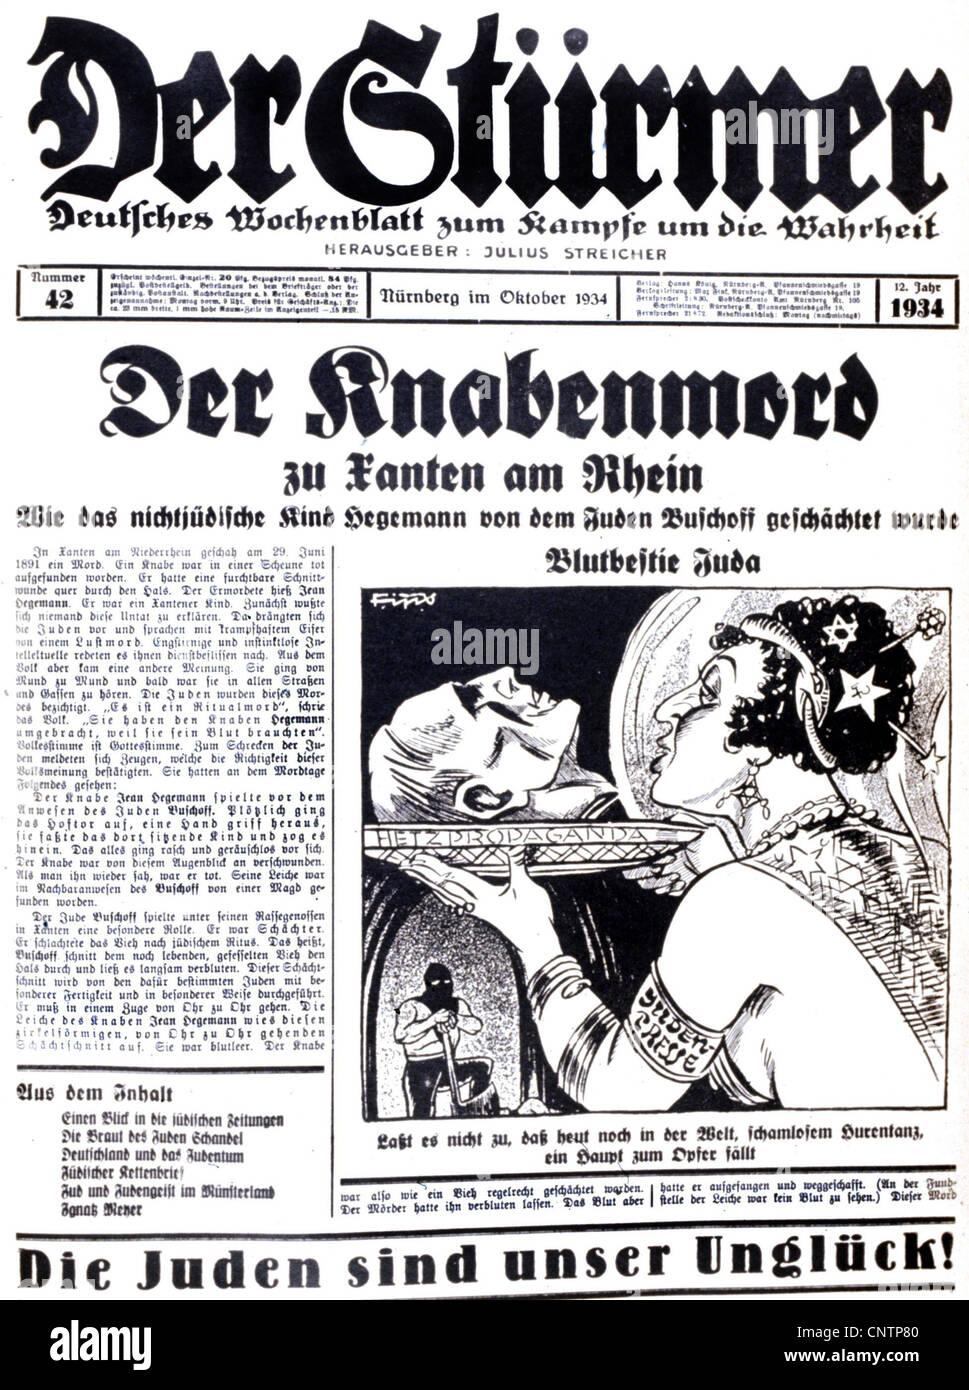 National Socialism / Nazism, propaganda, press / media, 'Der Stuermer', No. 42, October 1934, front page, - Stock Image